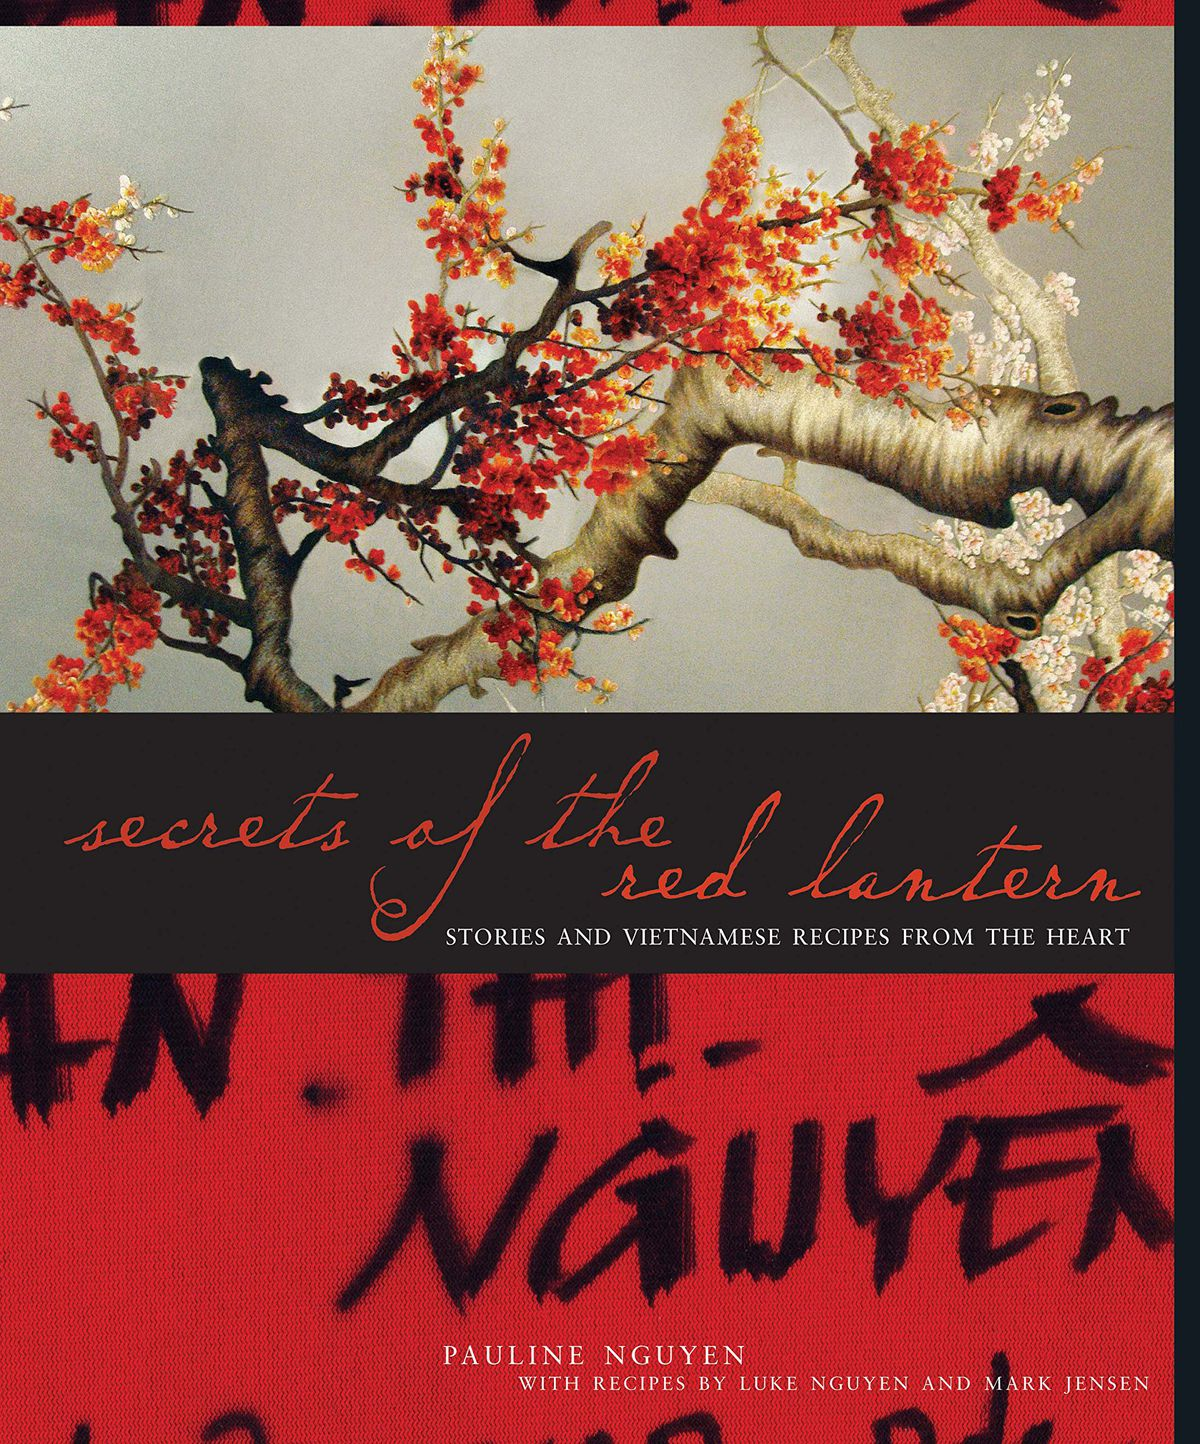 The Secrets of the Red Lantern by Pauline Nguyen, Luke Ngugyen and Mark Jensen, one of the best cookbooks chosen by Eater writers